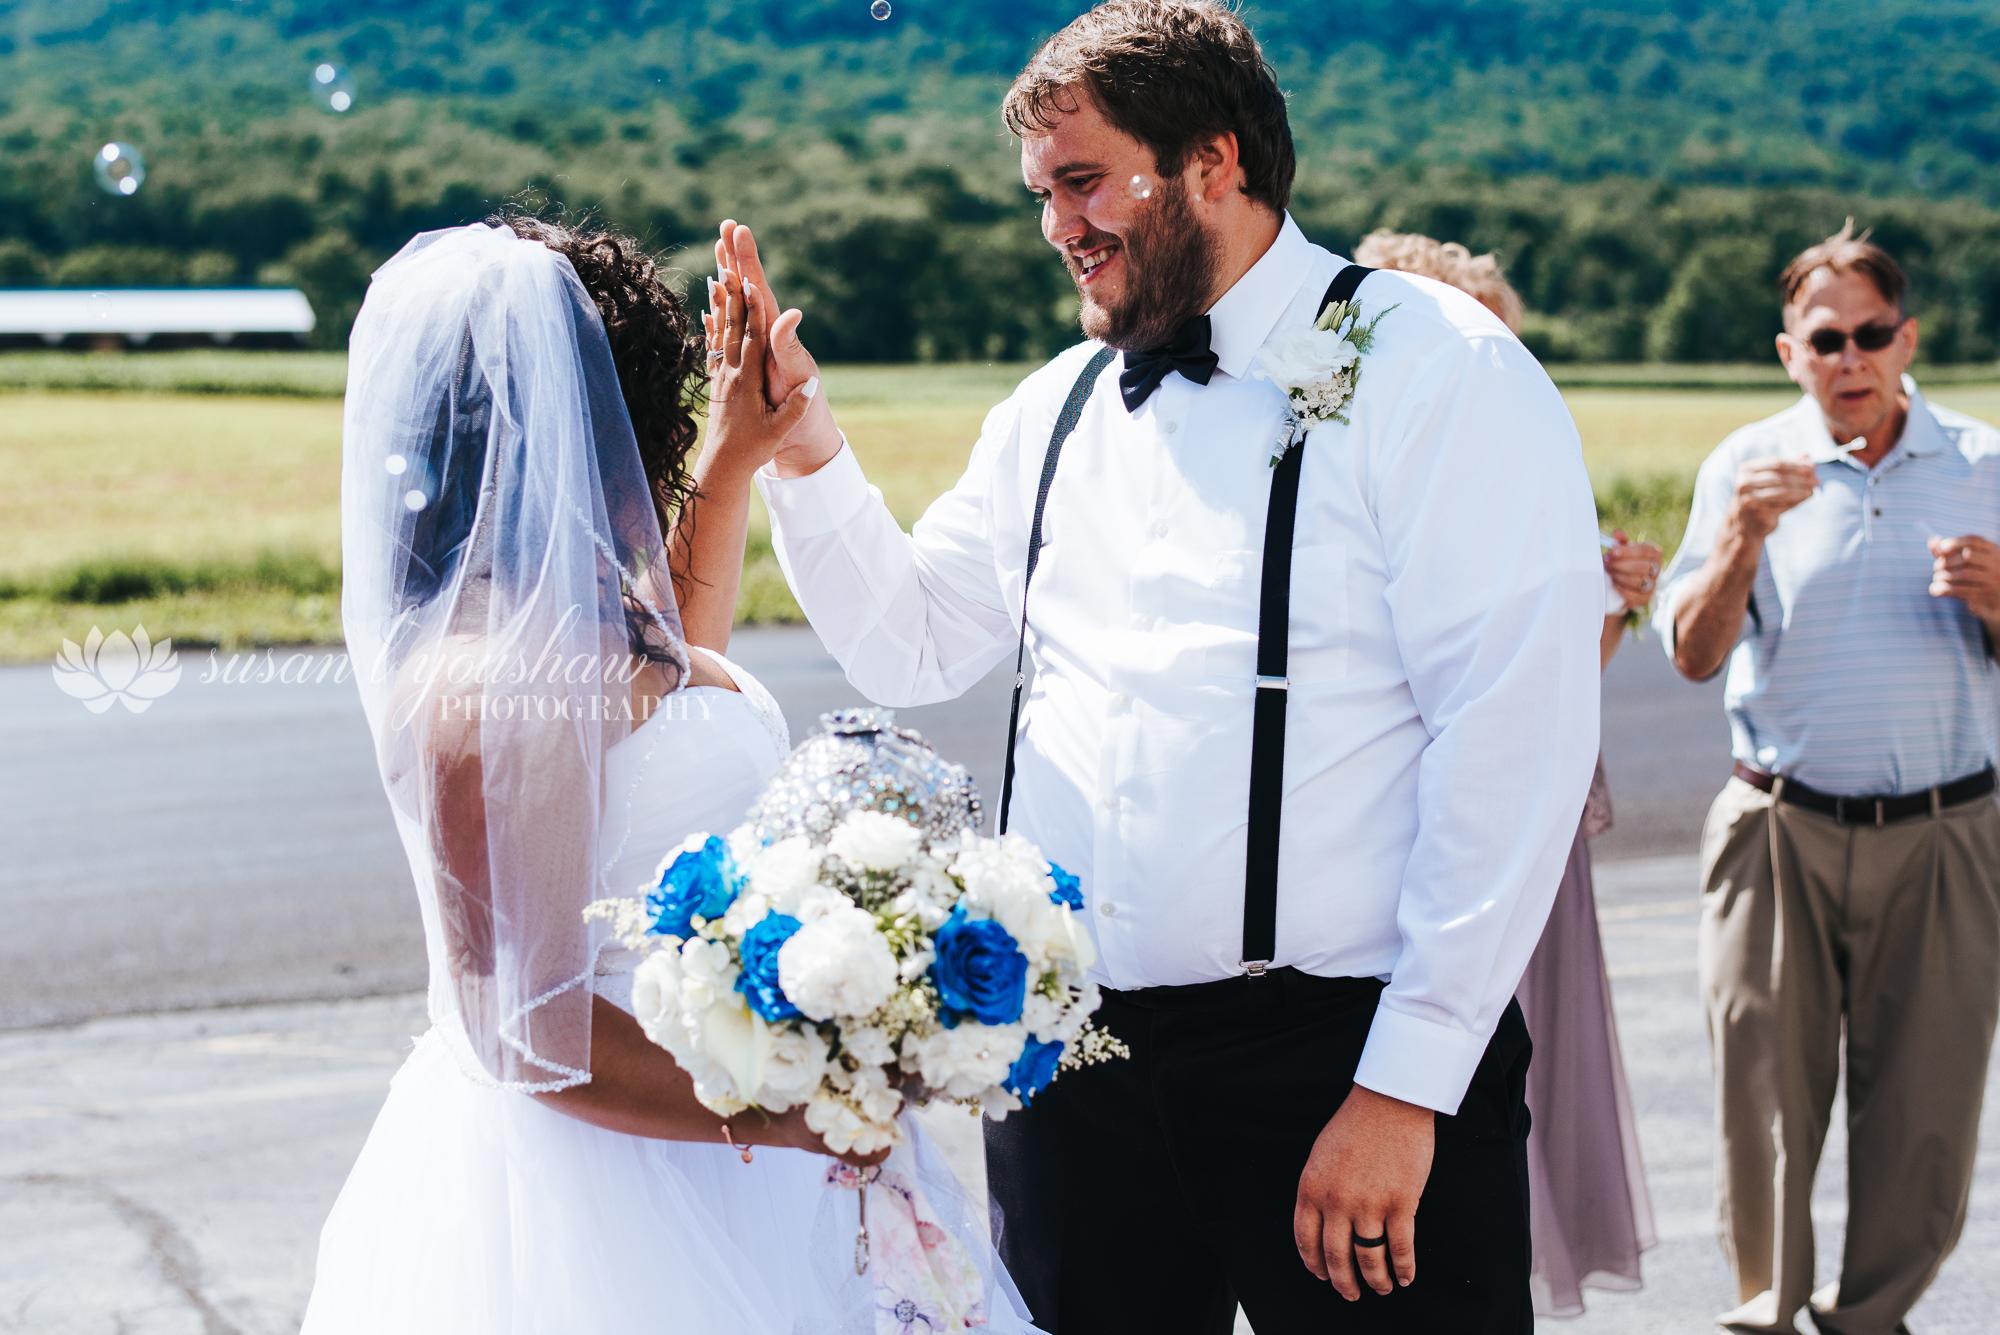 Katelyn and Wes Wedding Photos 07-13-2019 SLY Photography-80.jpg